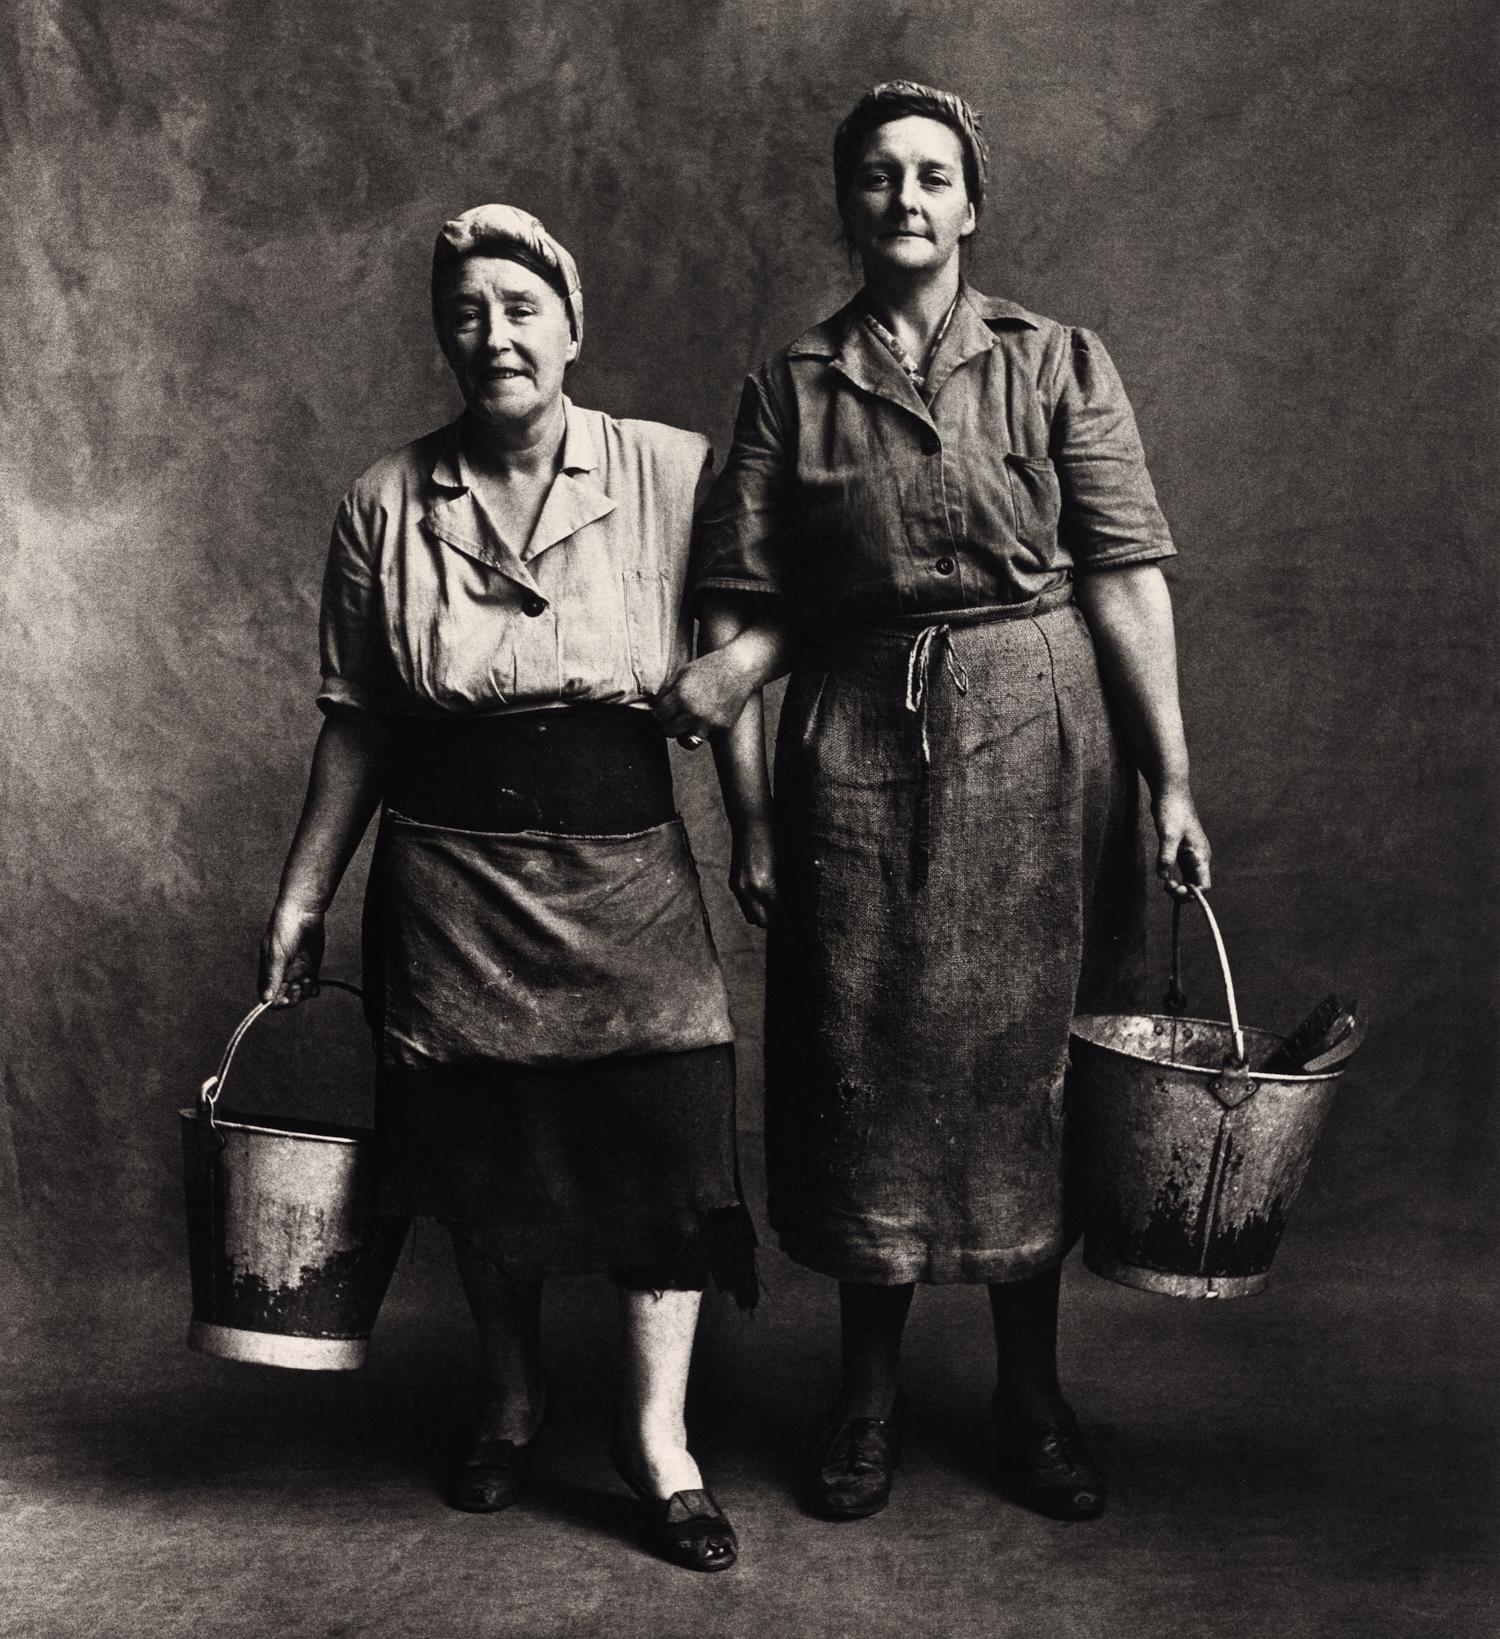 Charwomen , London, 1950 Gelatin silver print © Condé Nast (Br.)